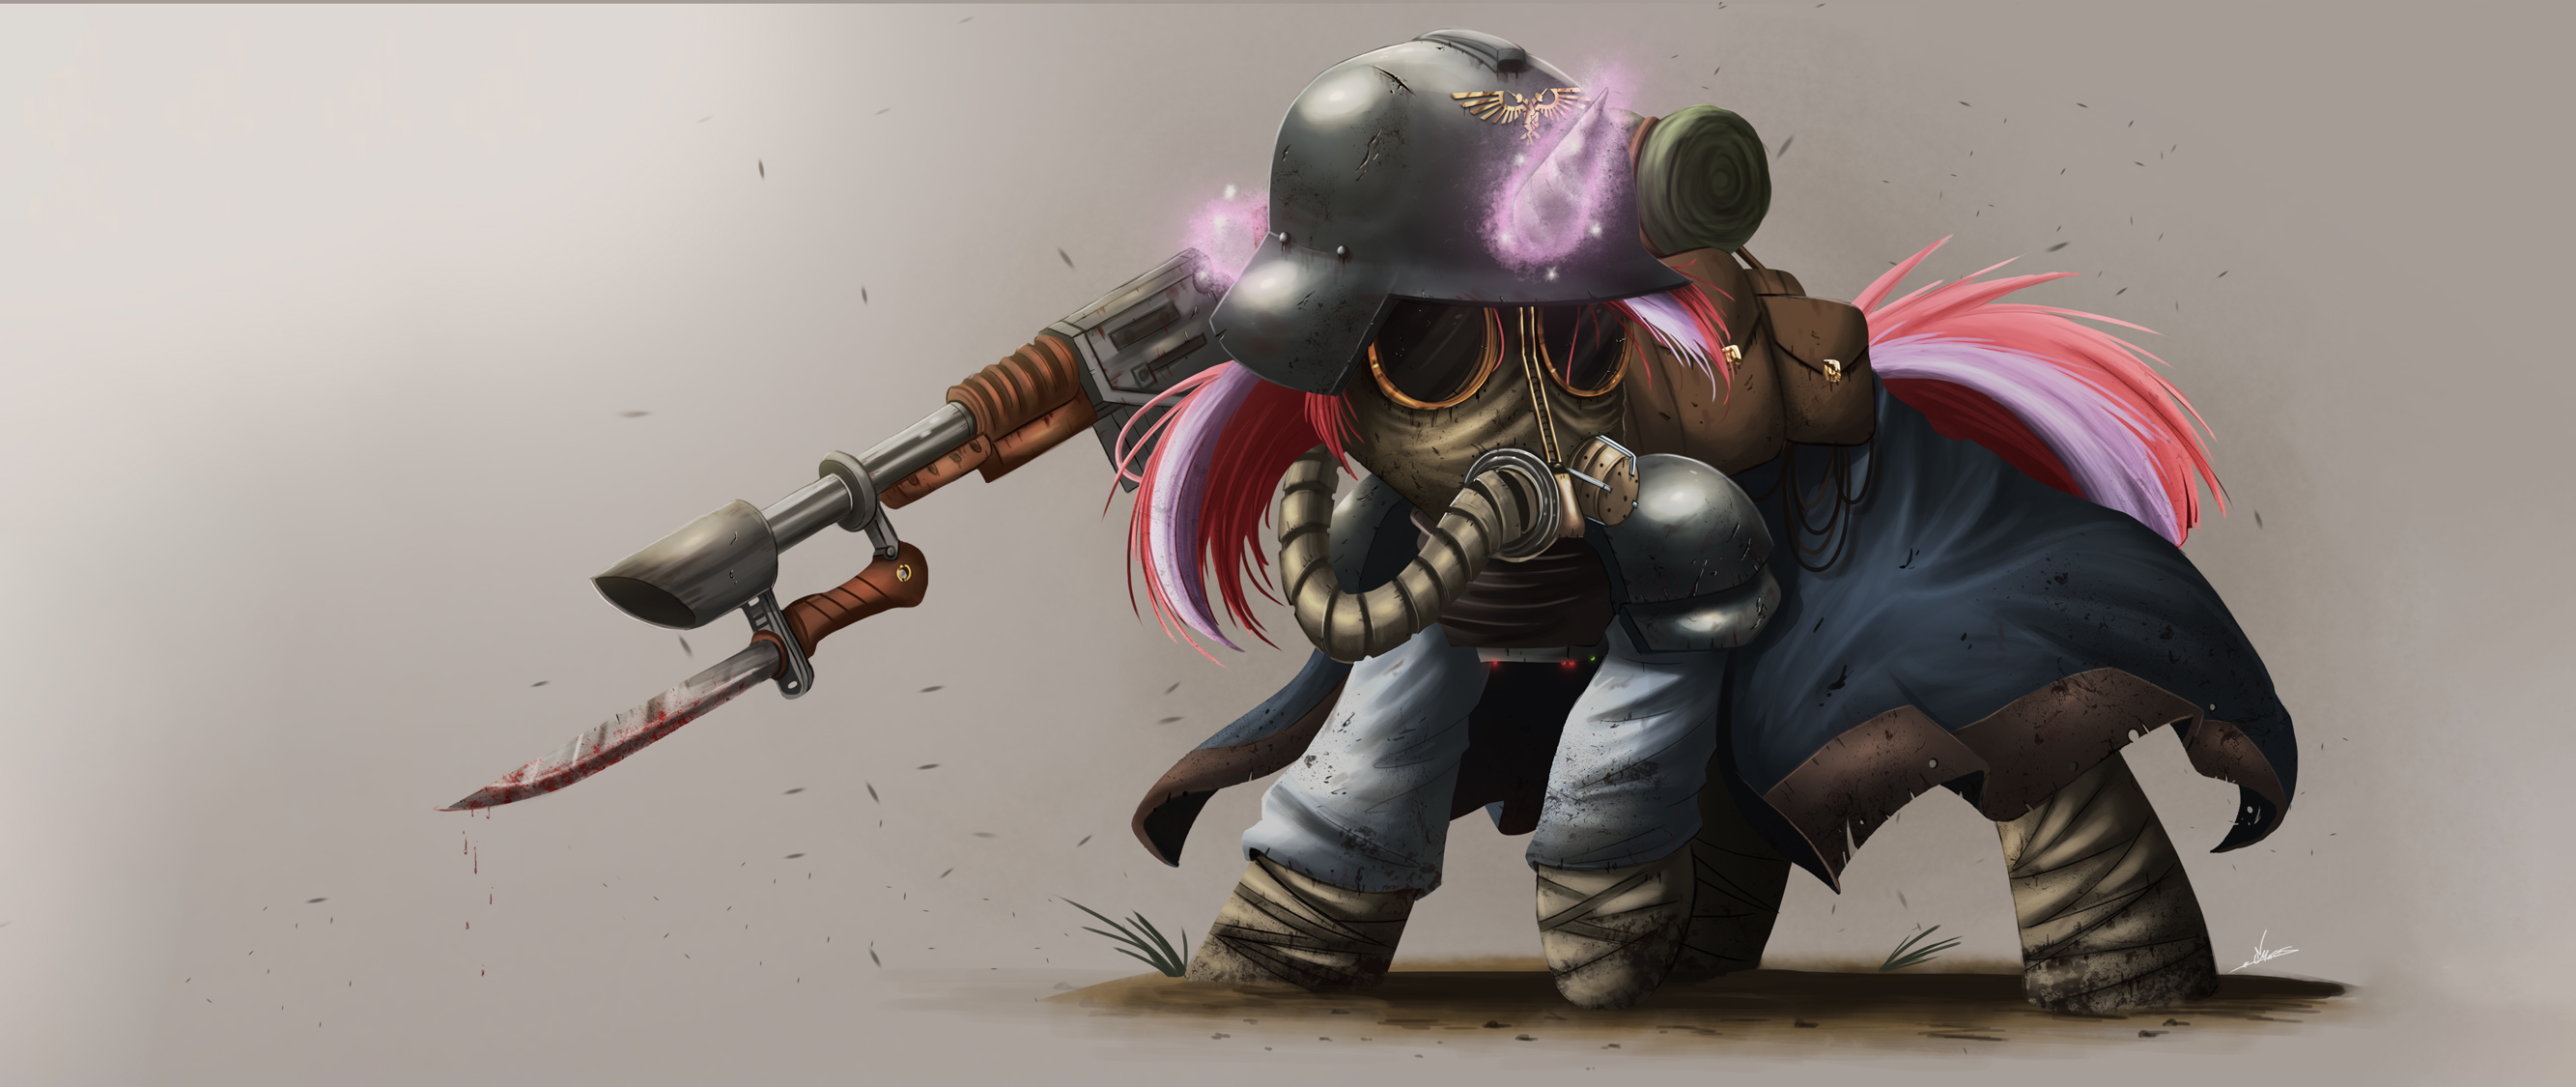 1302609 Armor Artistncmares Bags Bayonet Blood